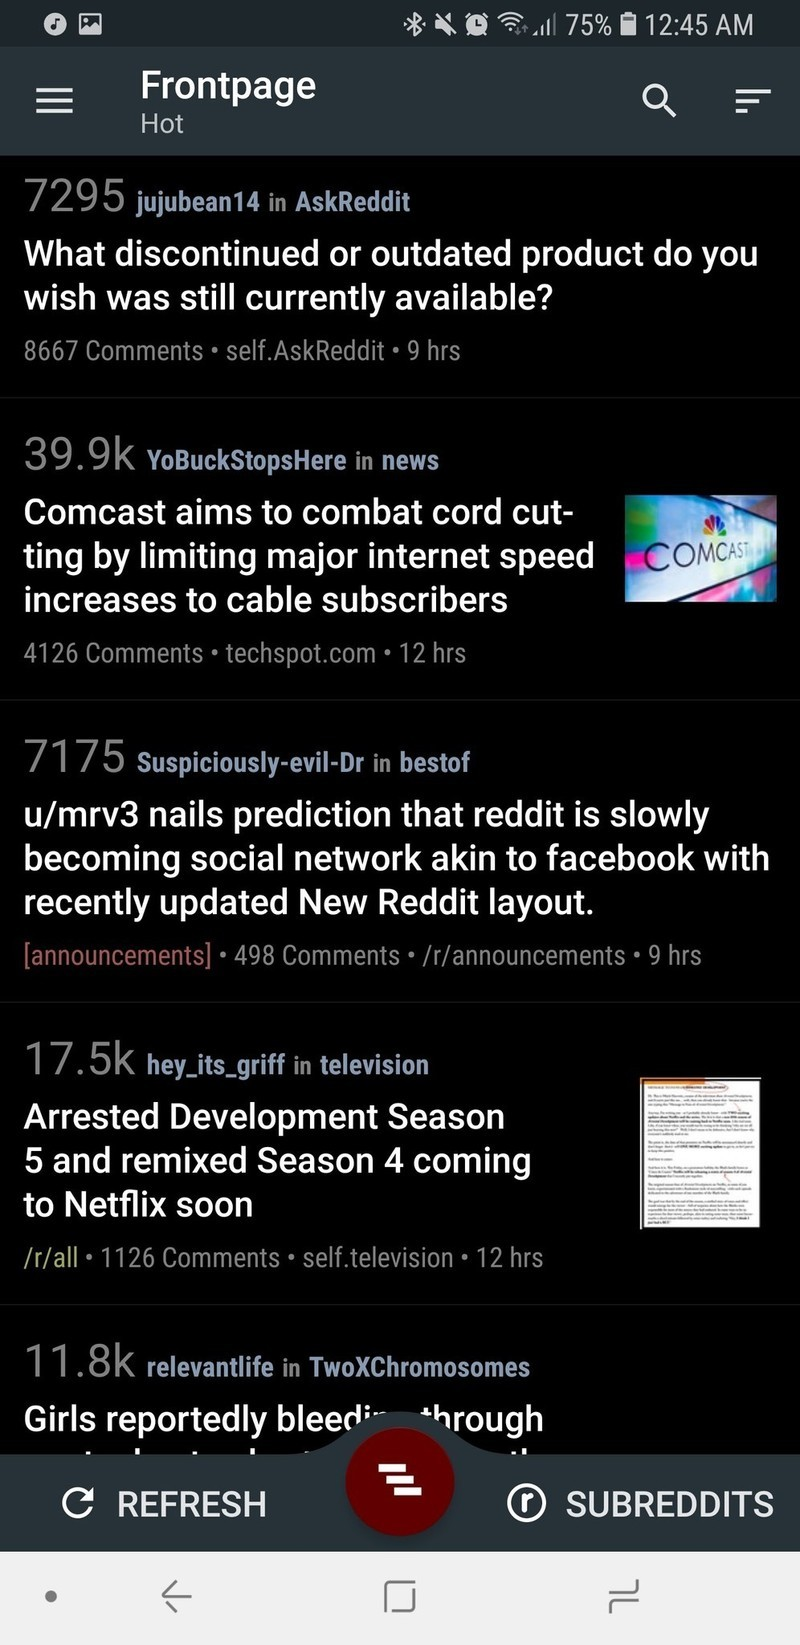 reddit-apps-relay-1.jpg?itok=_N2tC0k9